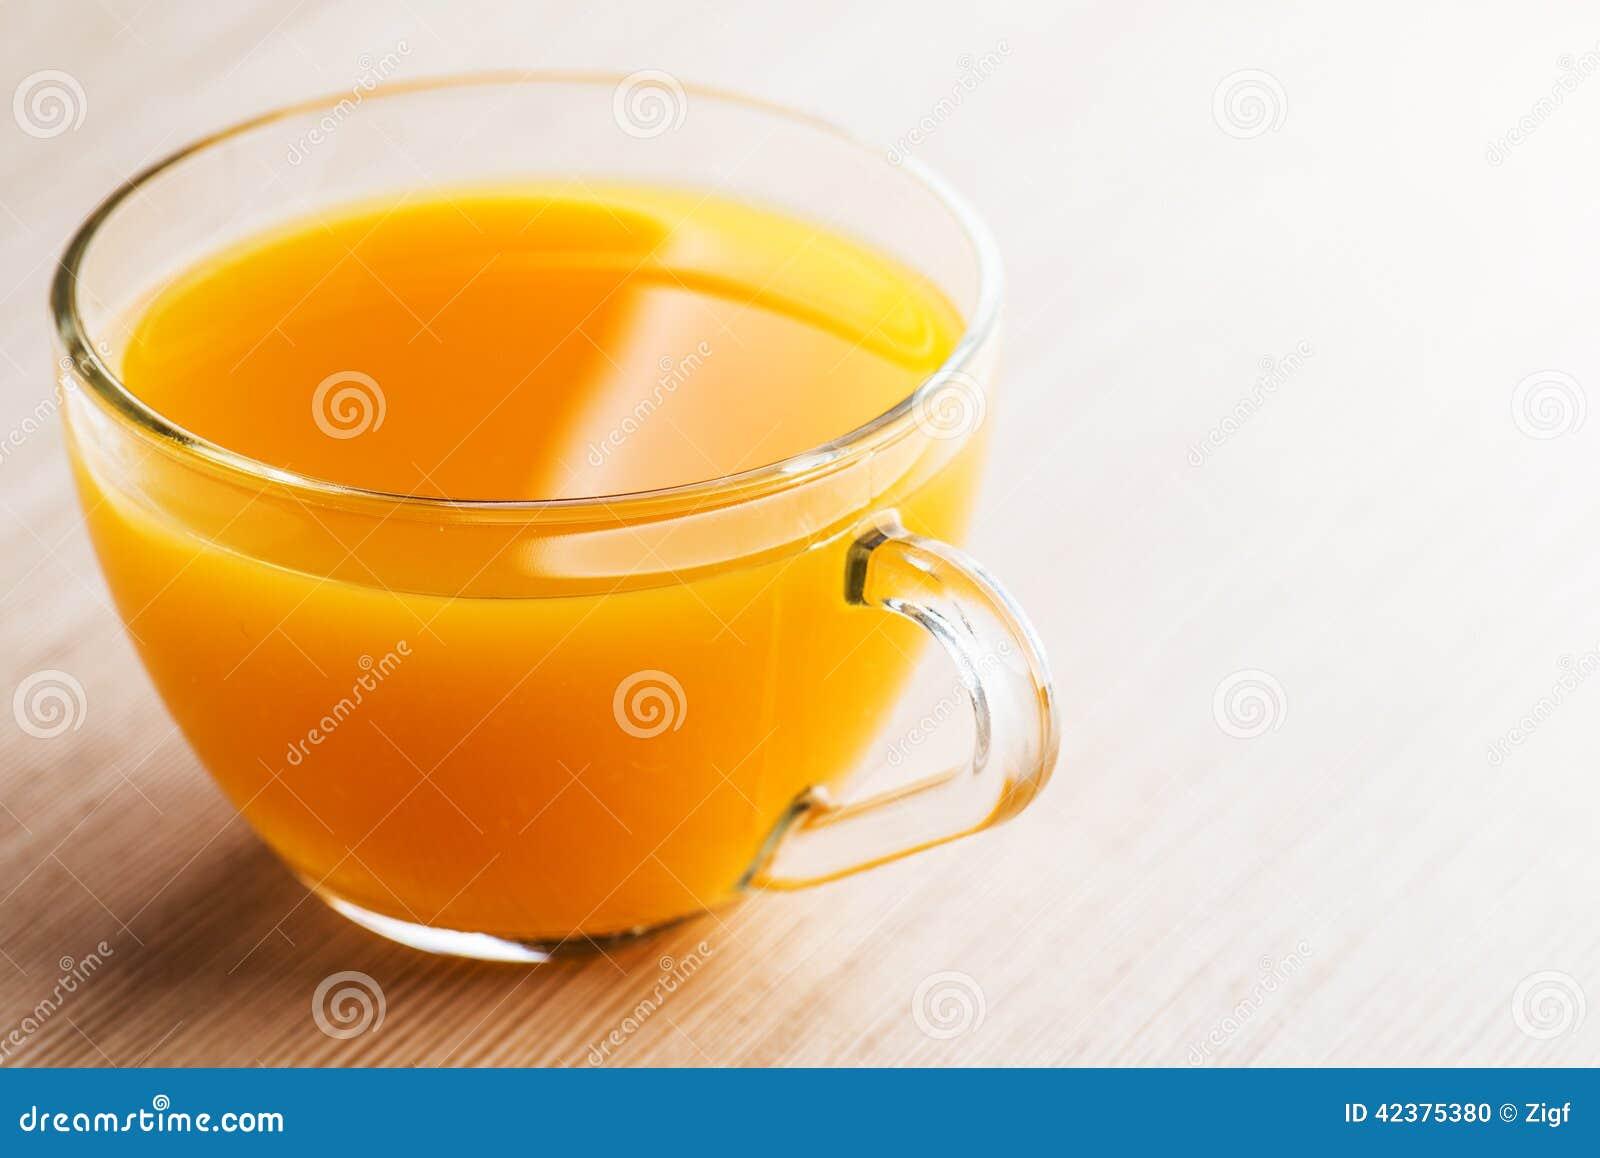 Jugo amarillo naranja foto de archivo imagen de travieso - Amarillo naranja ...